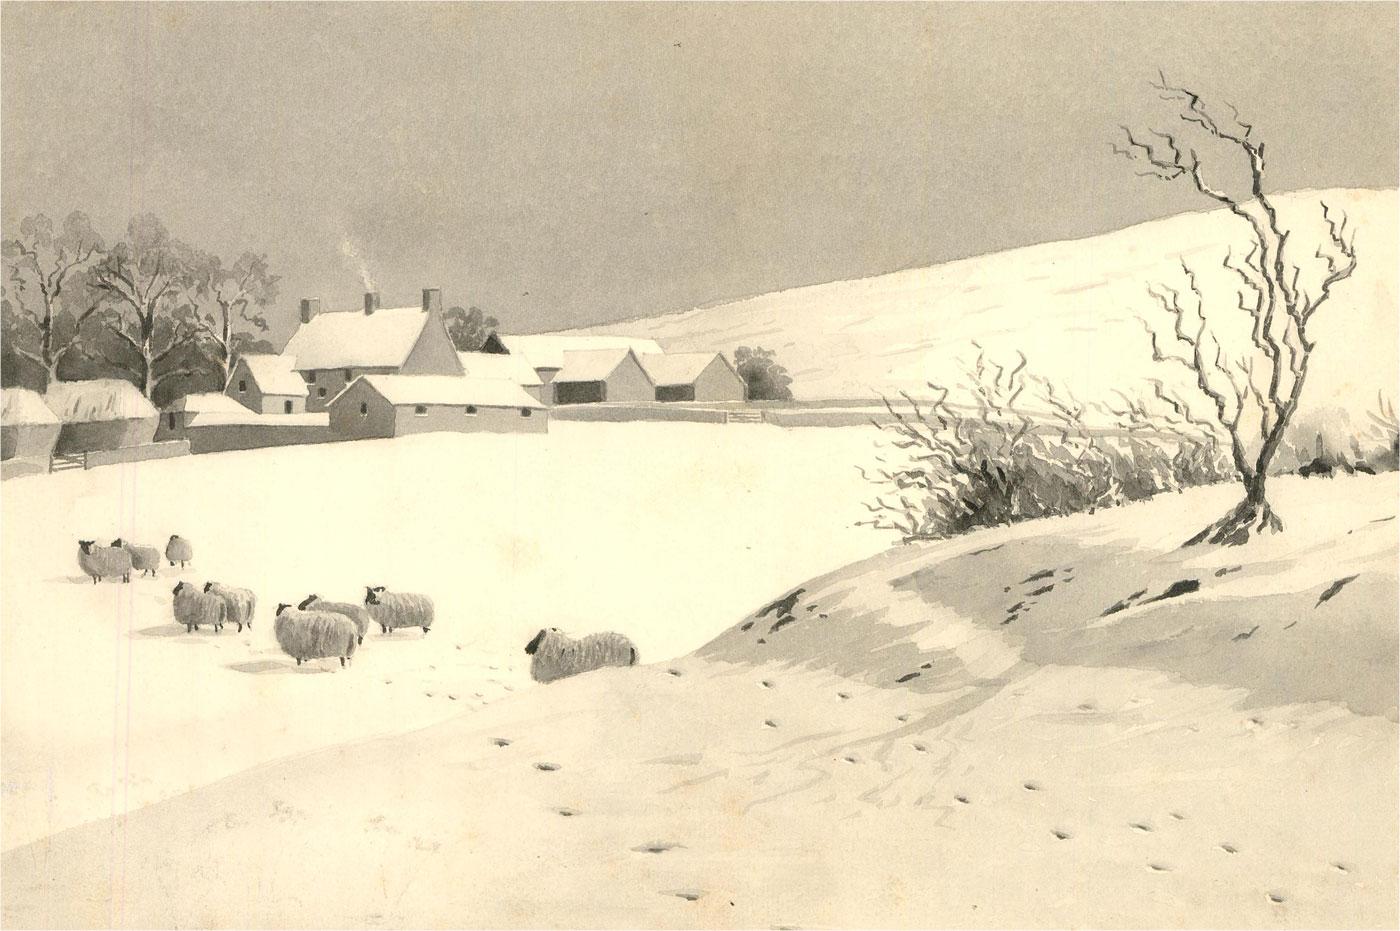 Raymond Turner Barker (1872-1945) - 1914 Watercolour, Winter Landscape